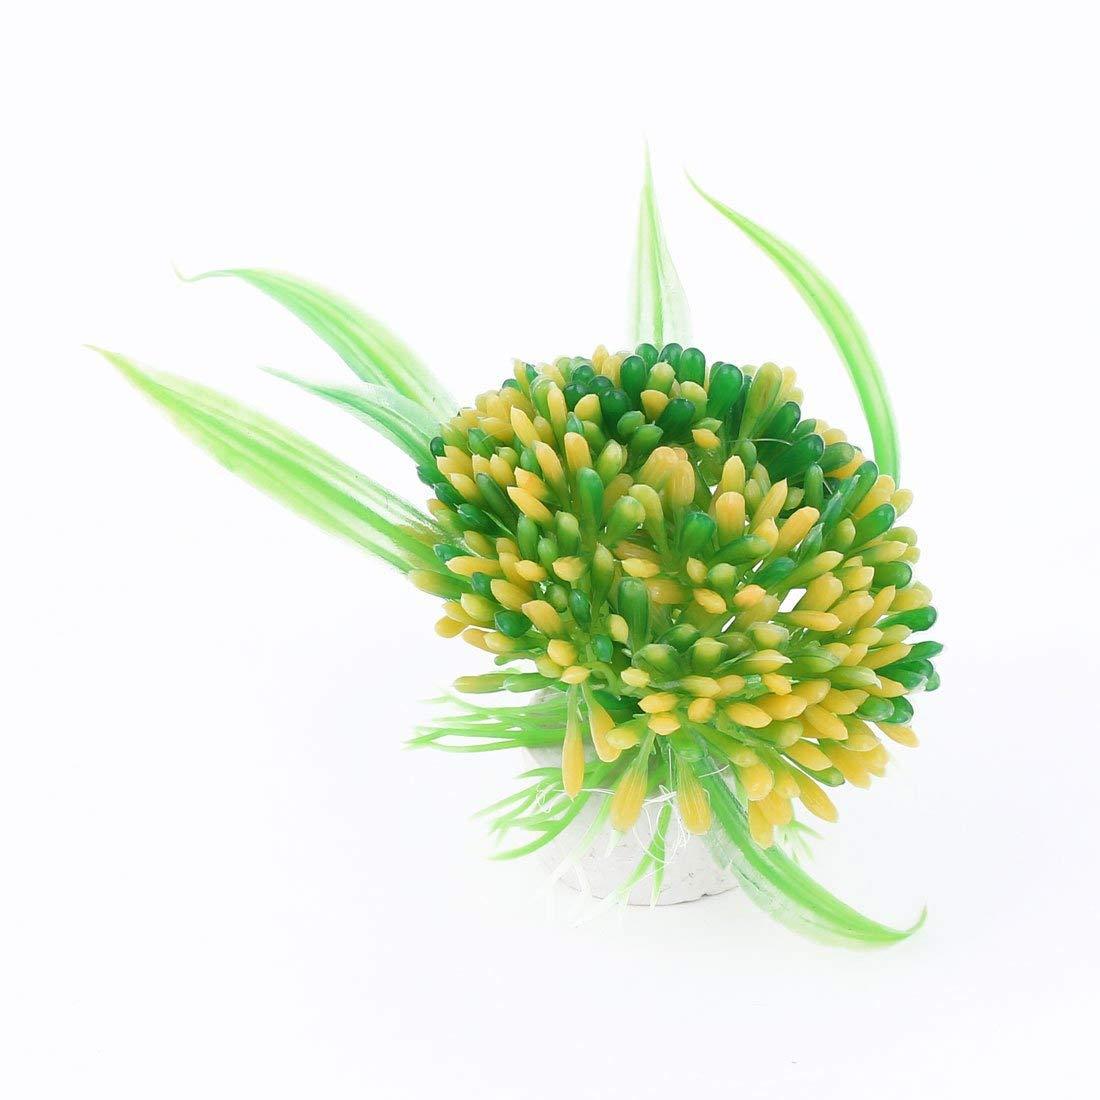 1Pc Ceramic Base Plastic Fish Tank Ornament Aquarium Plants Manmade Water Grass